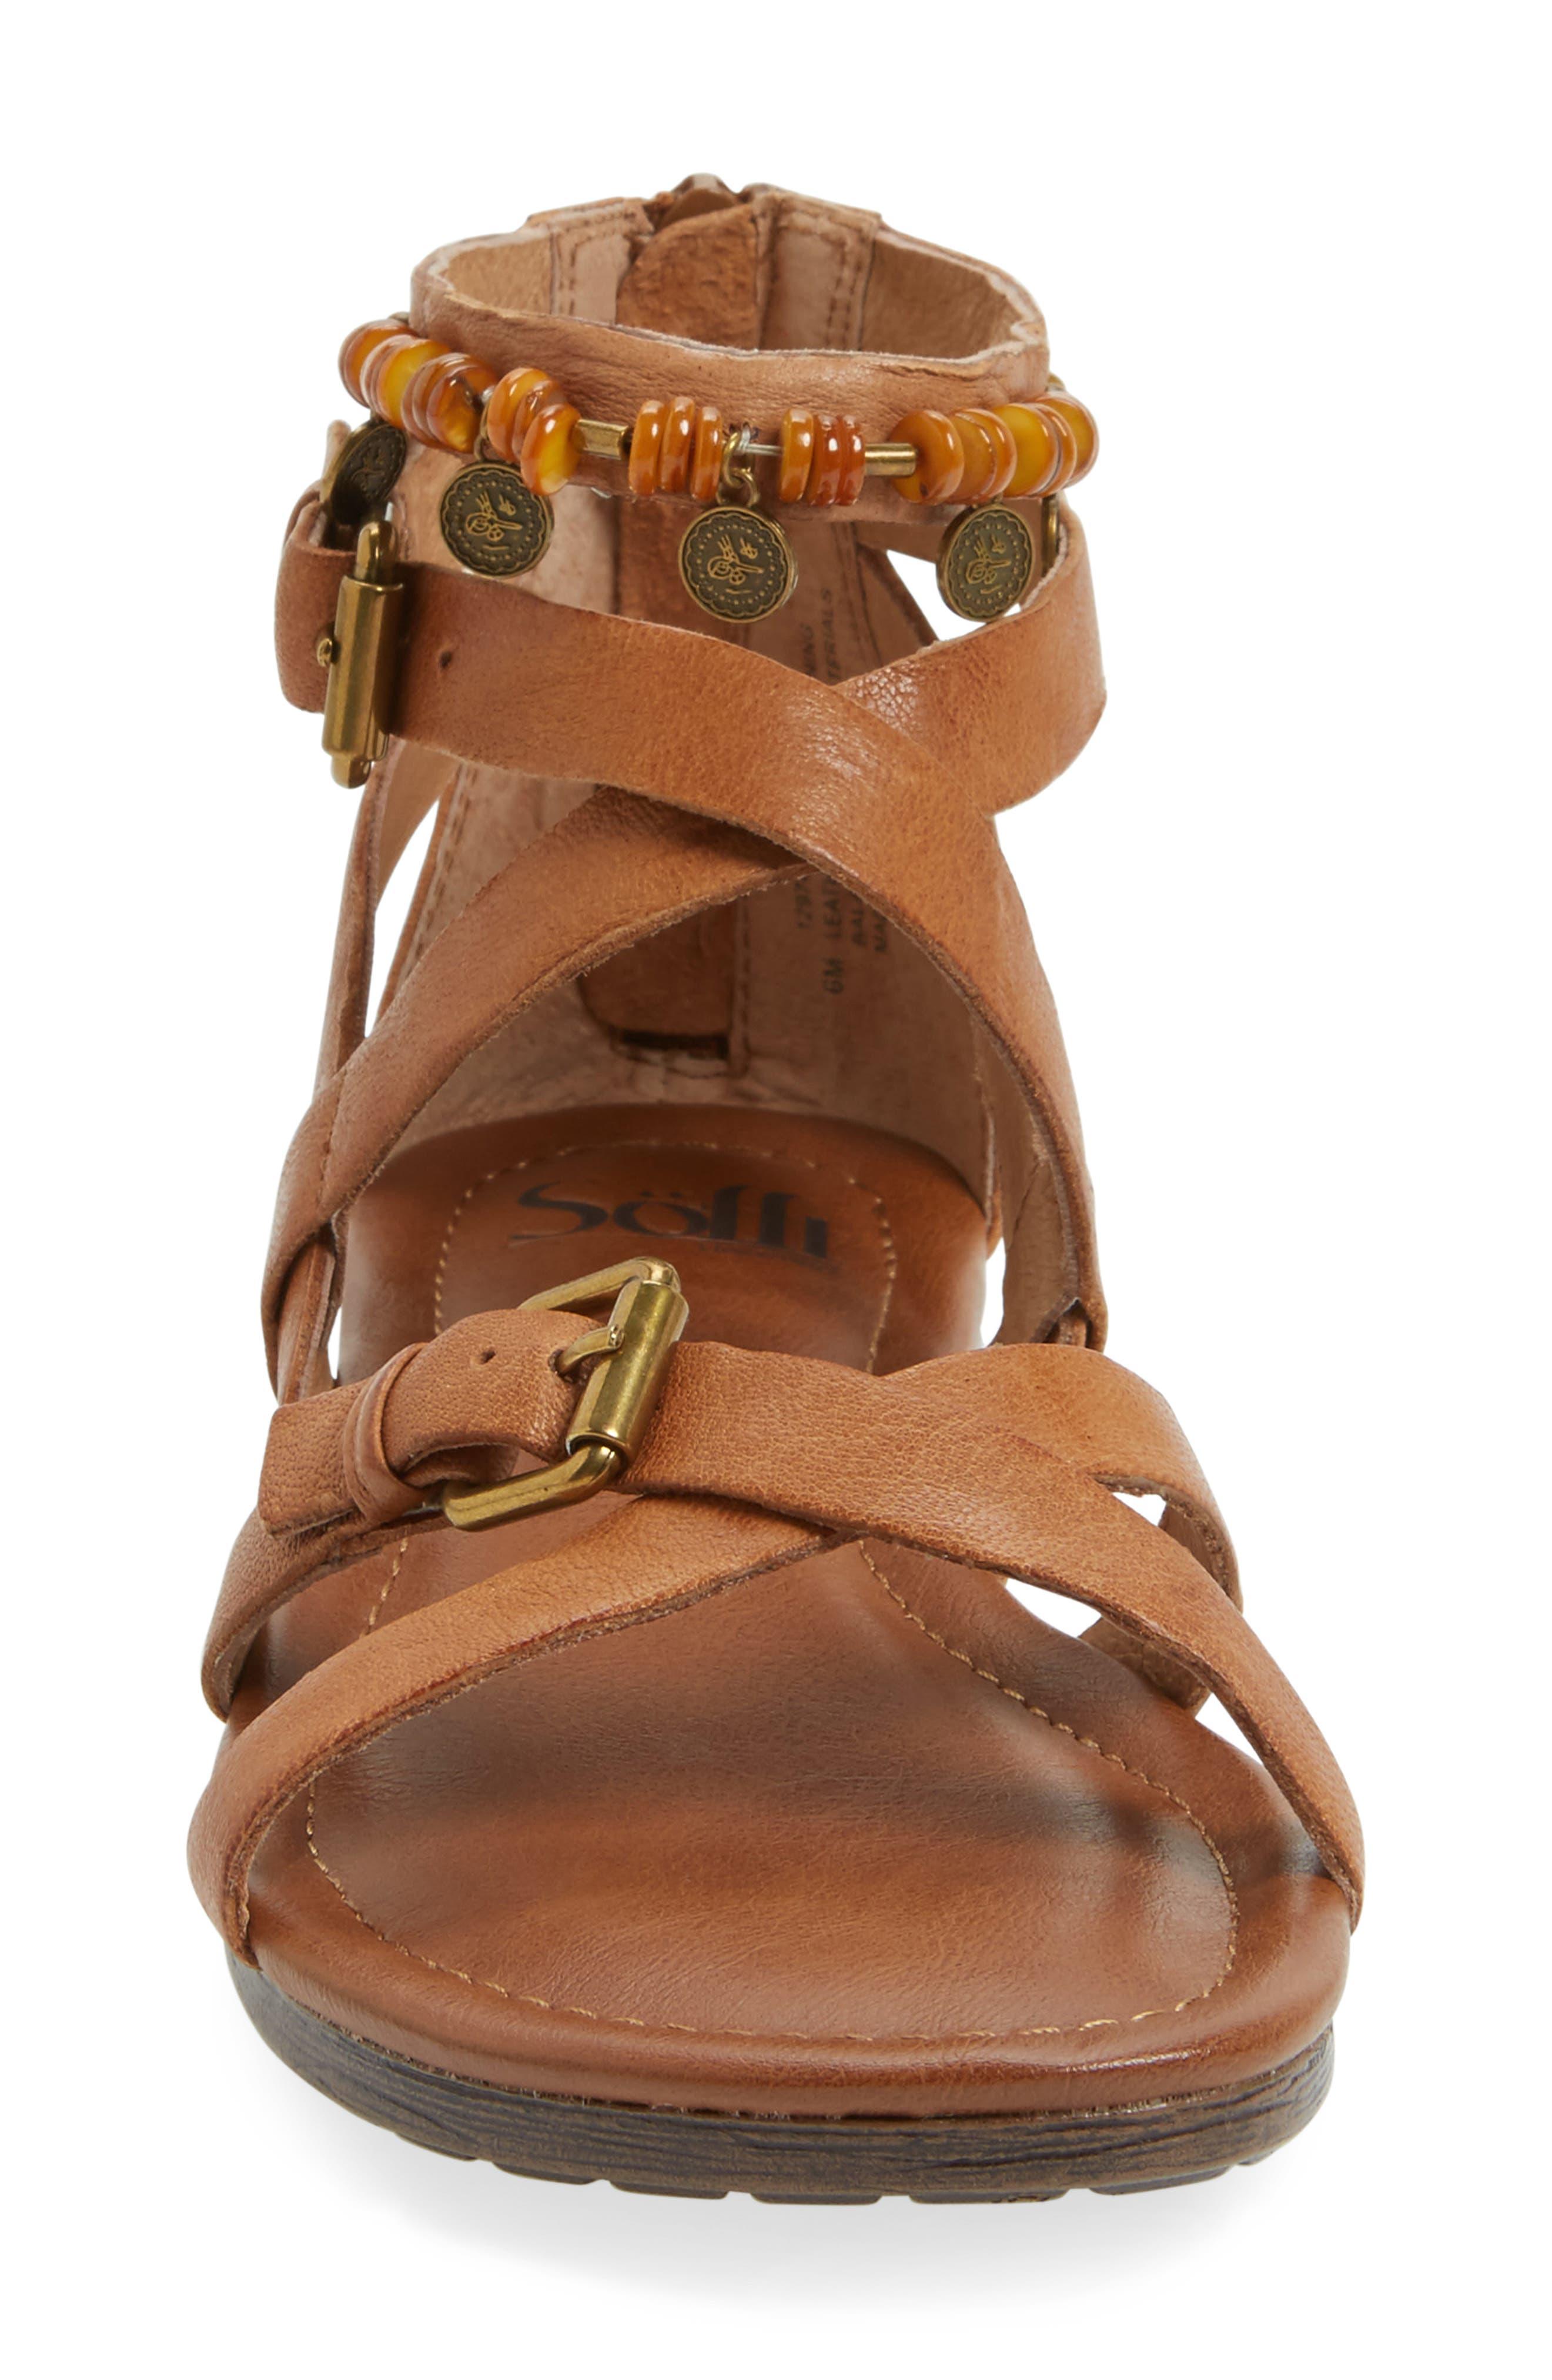 Boca Caged Sandal,                             Alternate thumbnail 3, color,                             Luggage Leather